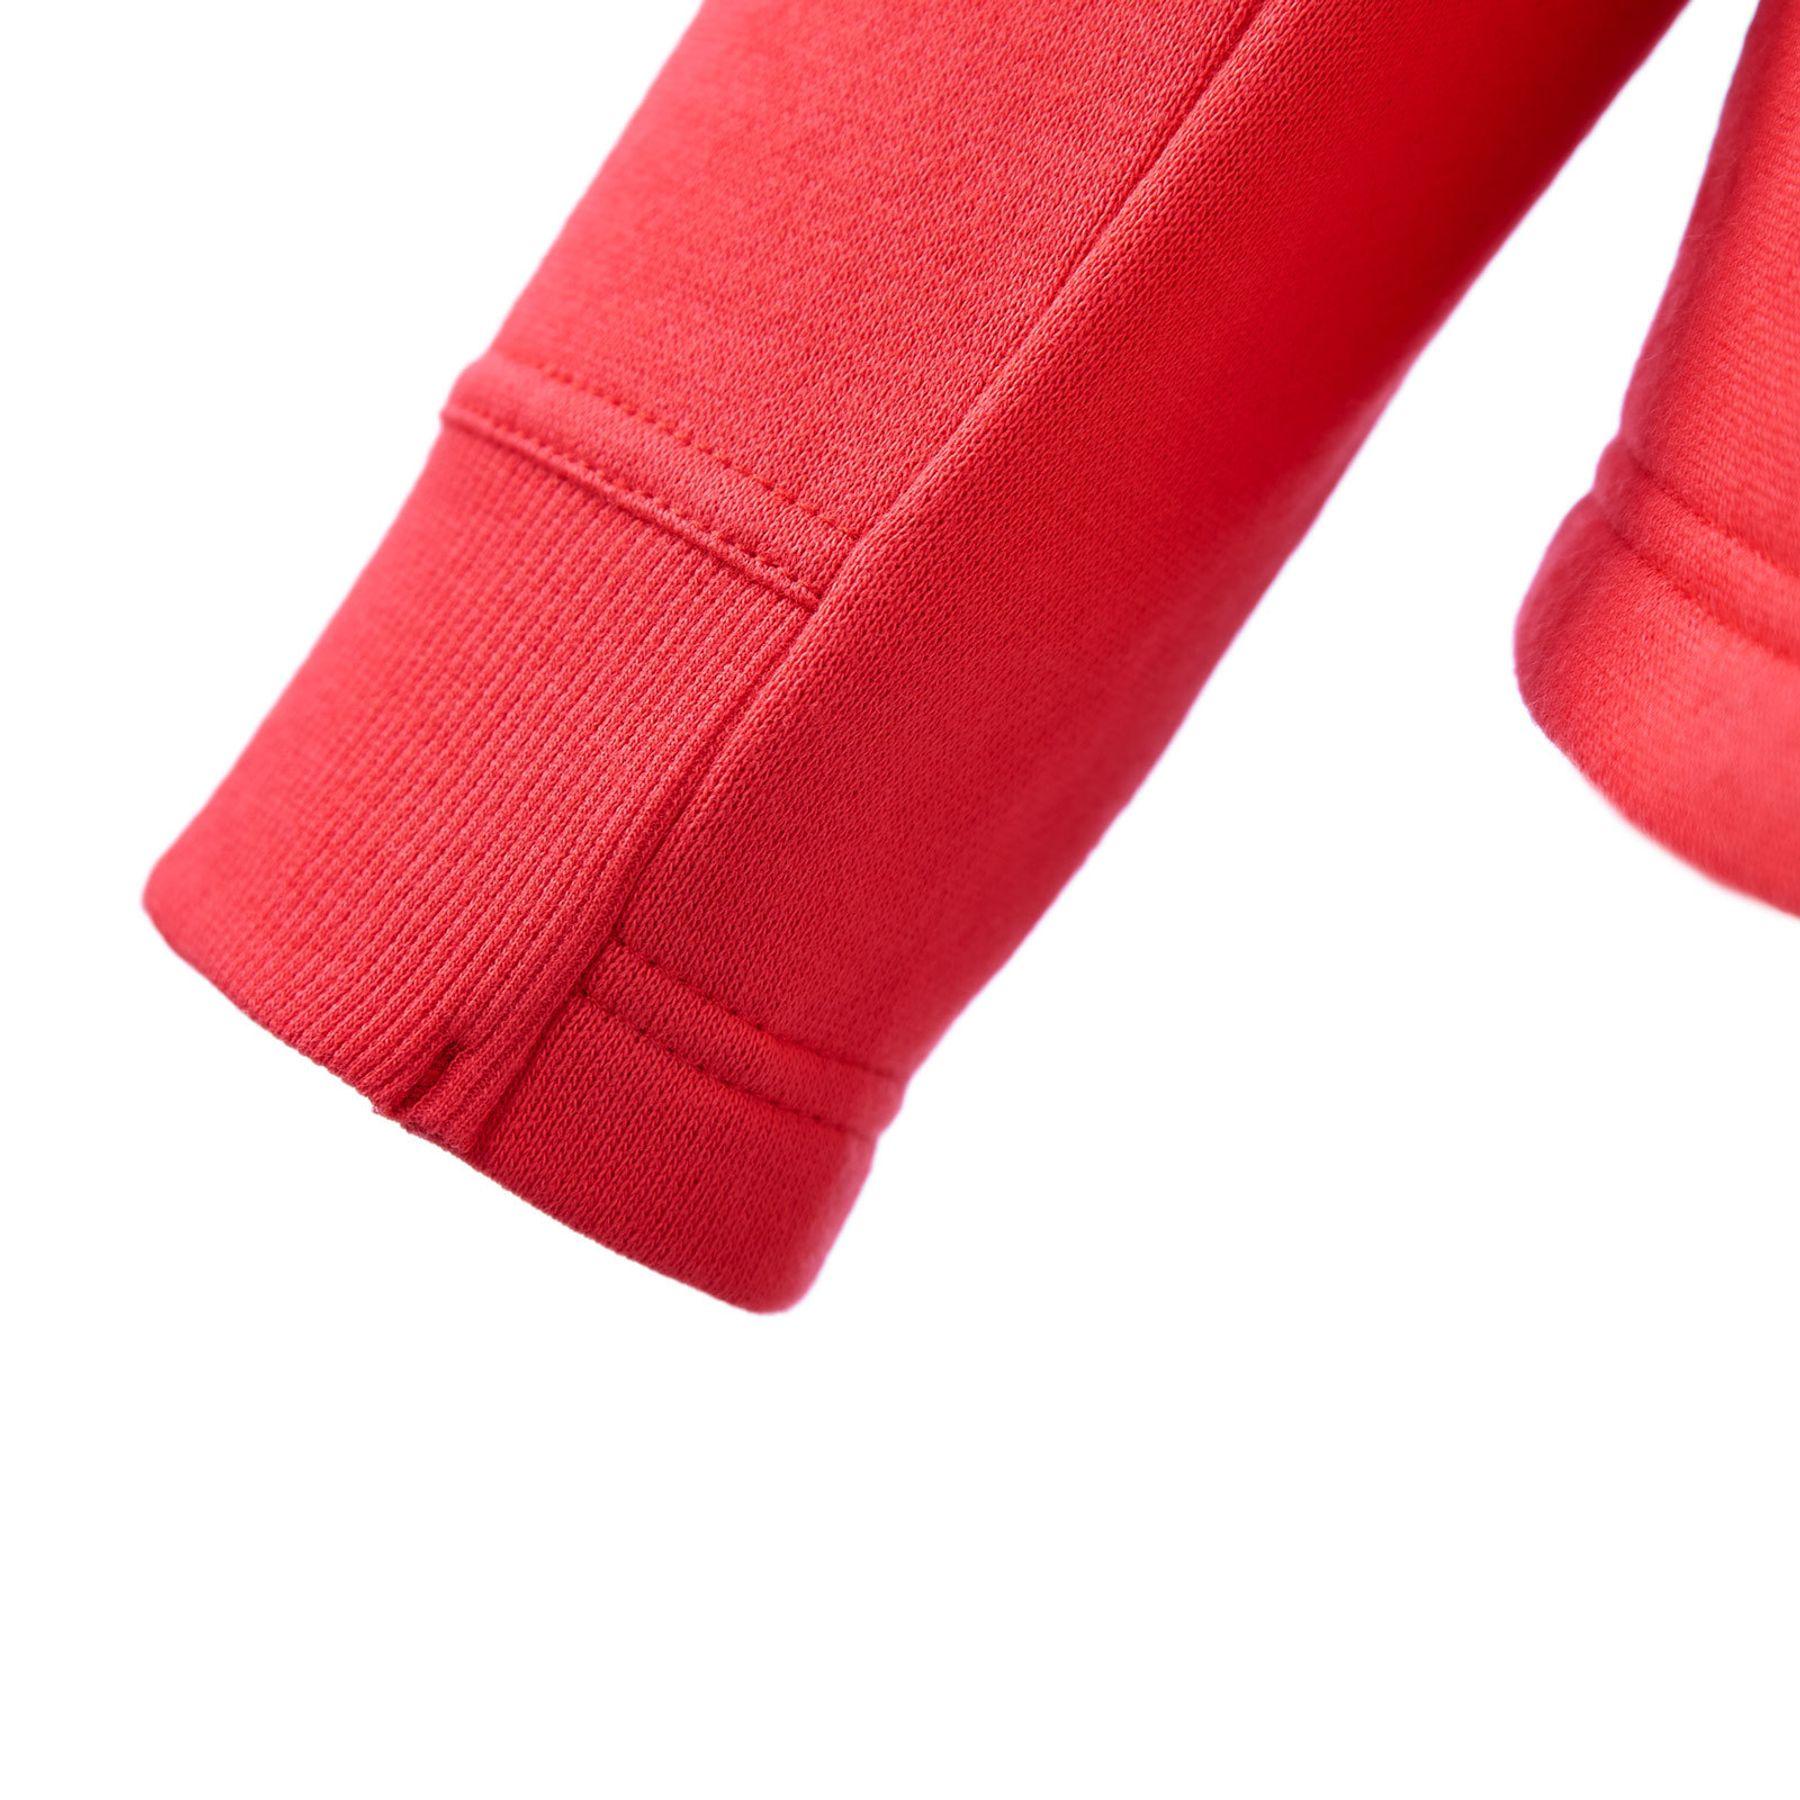 Joy - Damen Sport und Freizeit Jacke in mehreren Farben, Paulina (34500) – Bild 17